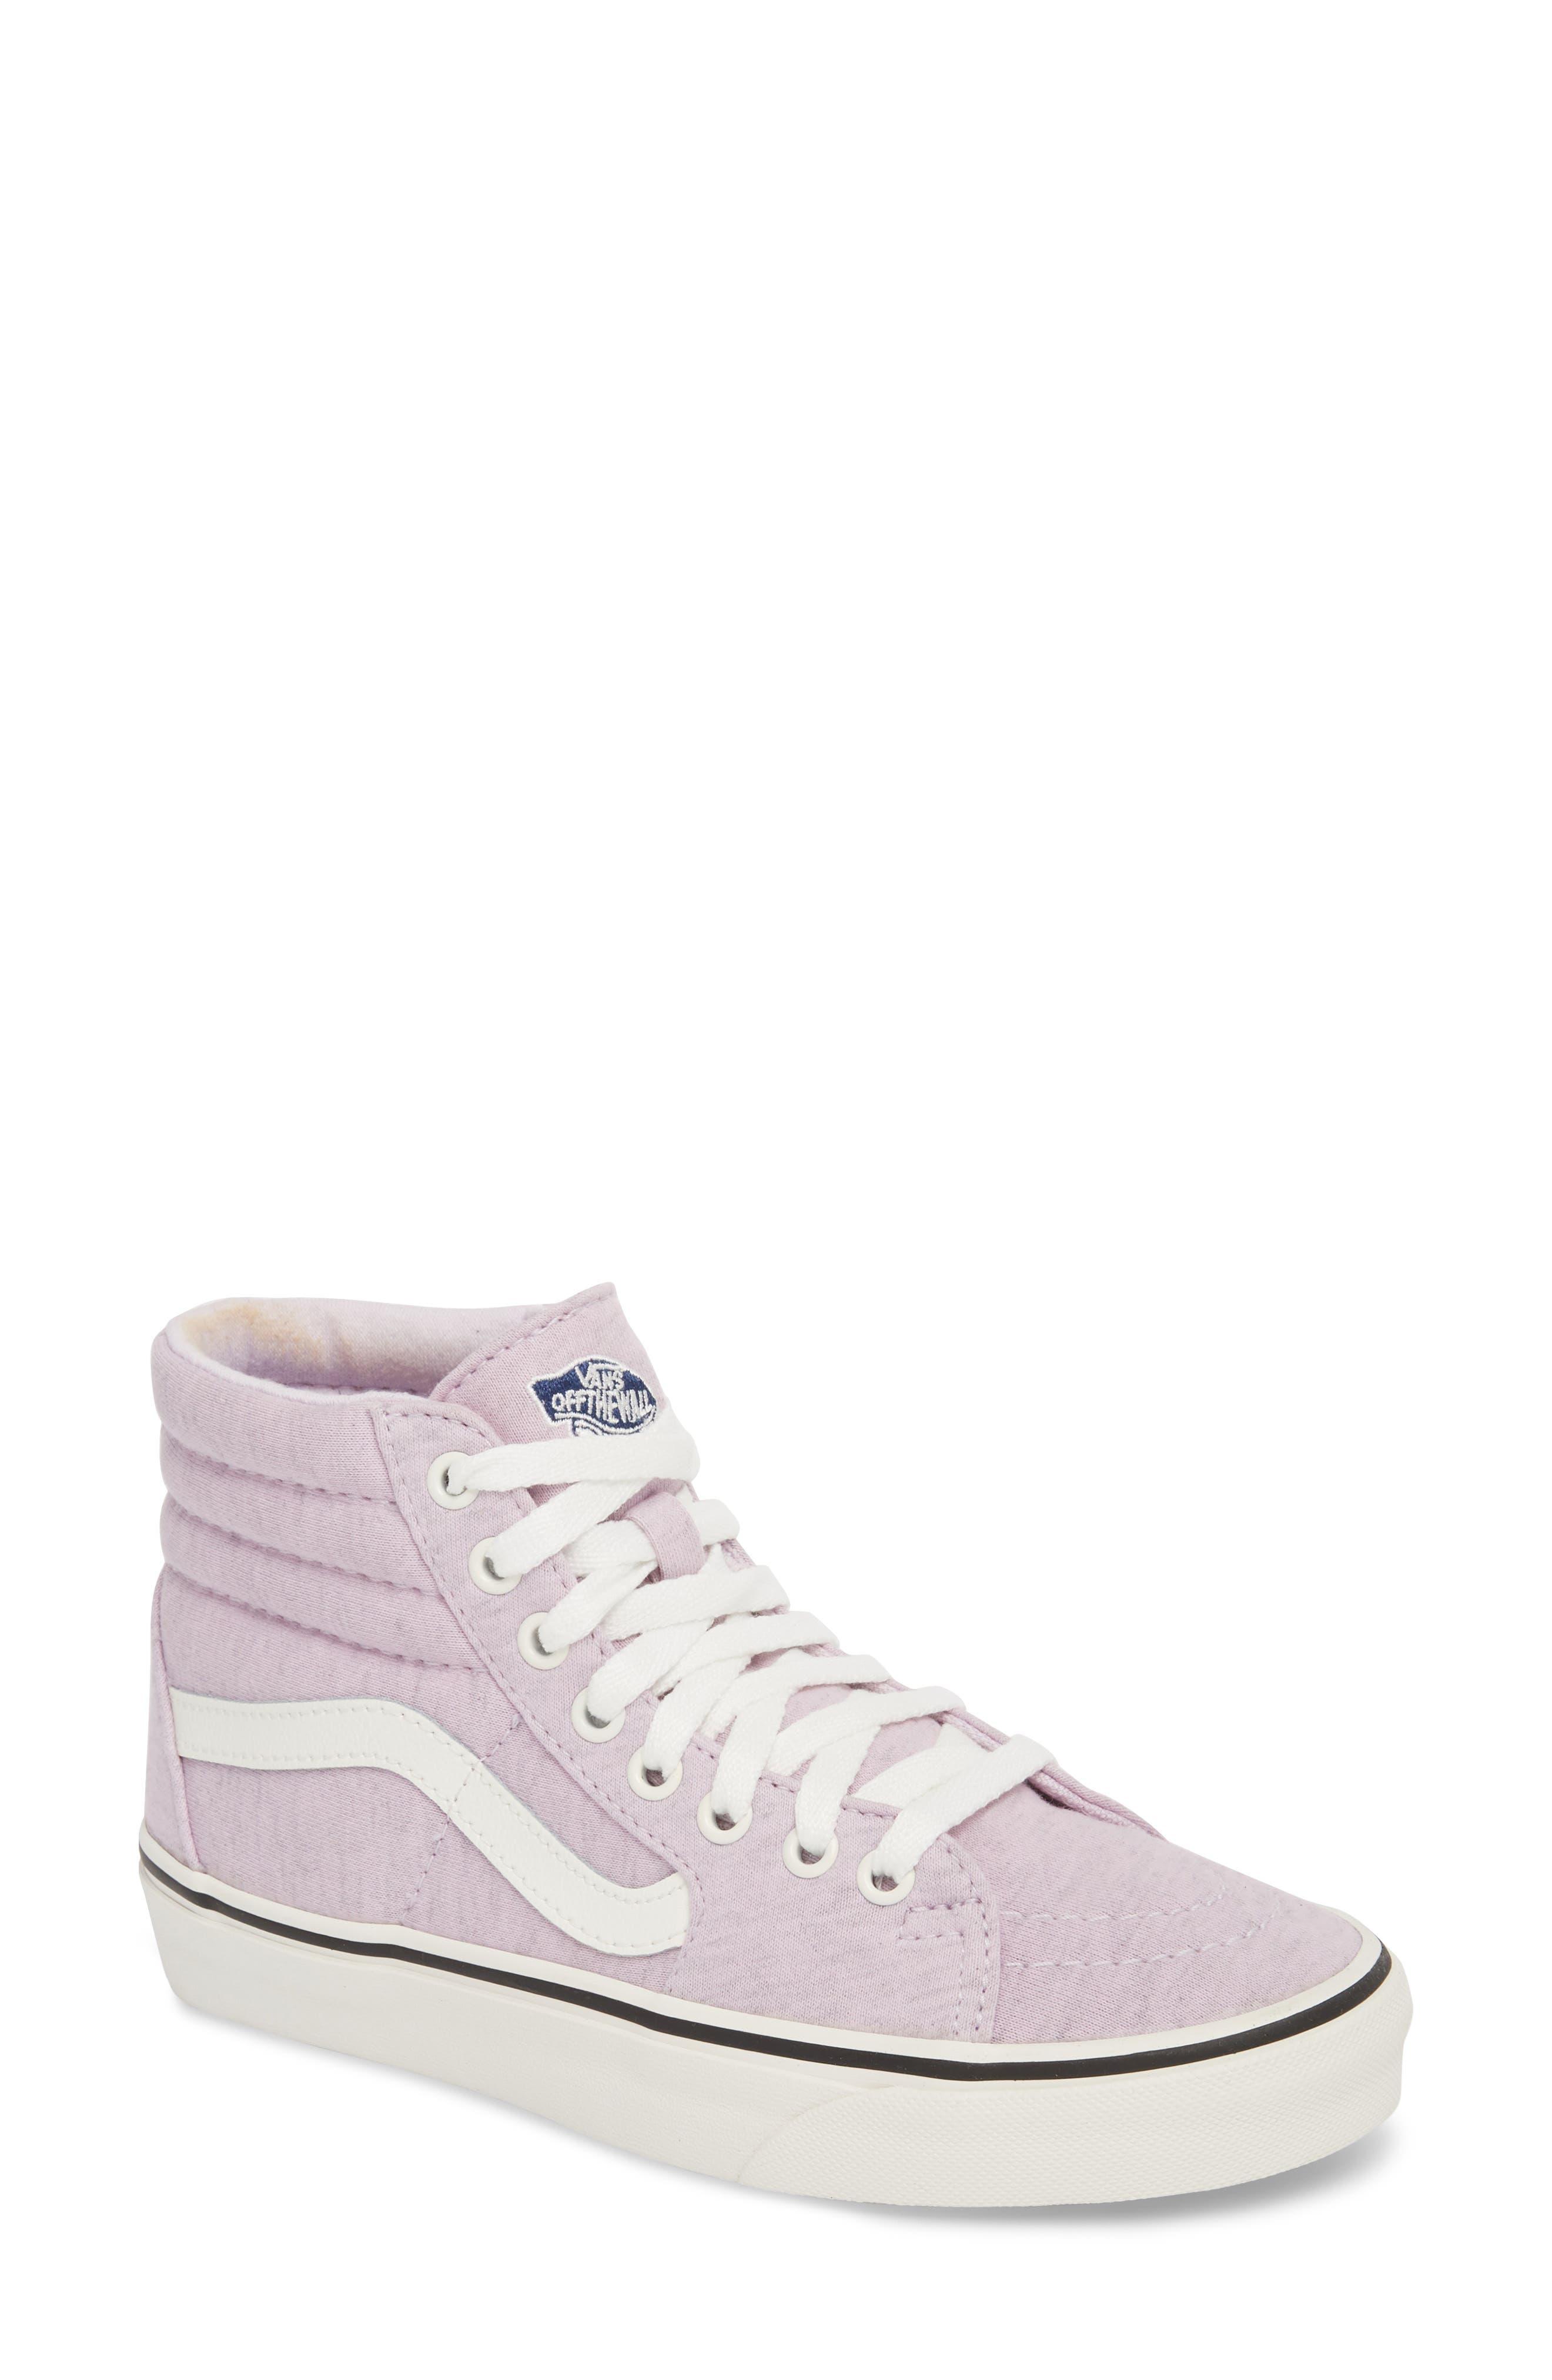 'Sk8-Hi' Sneaker,                         Main,                         color, Lavender Fog/ Snow White